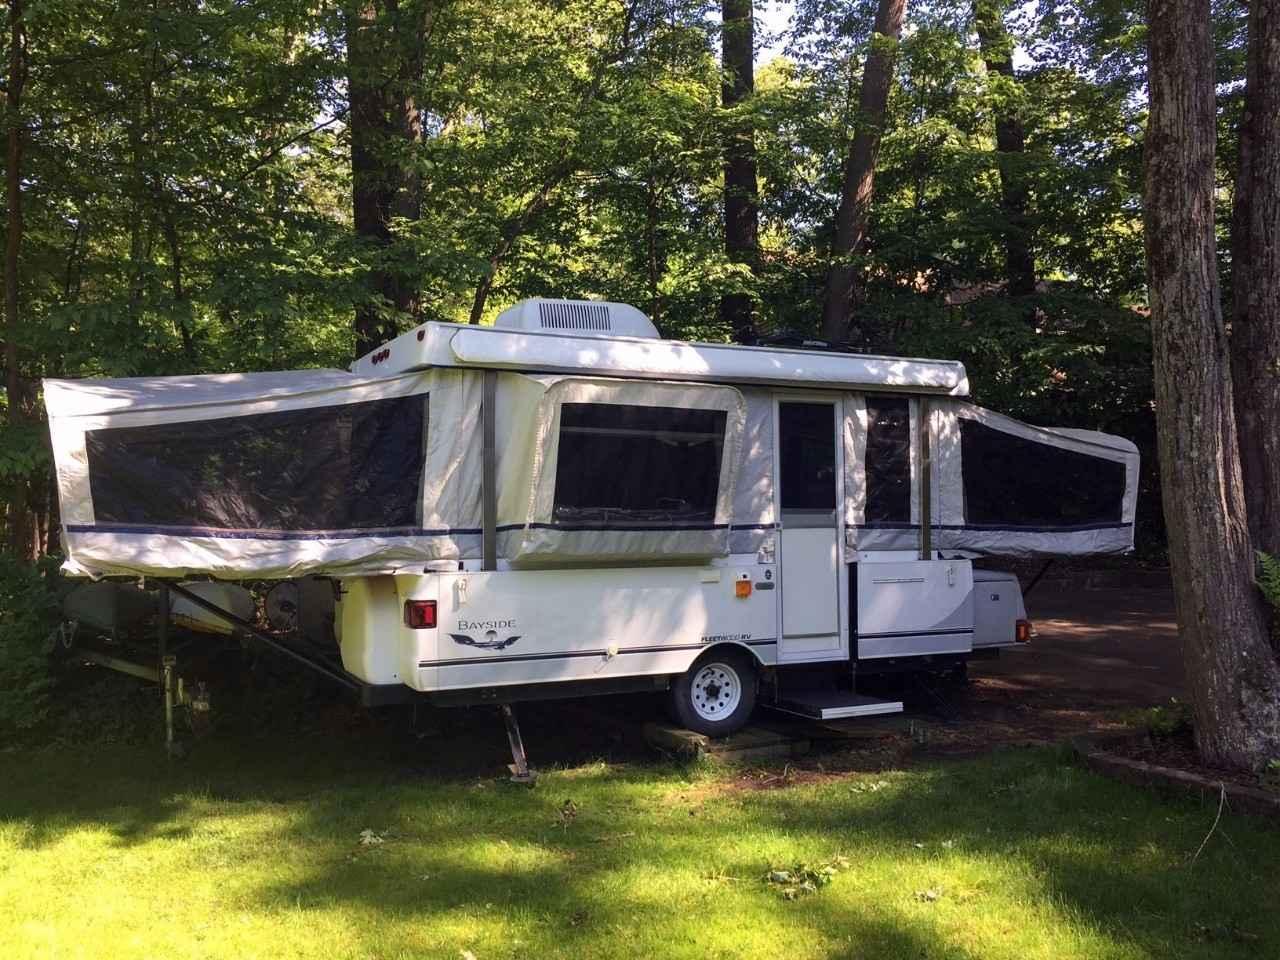 2003 Used Coleman BAYSIDE ELITE Pop Up Camper In Michigan MI